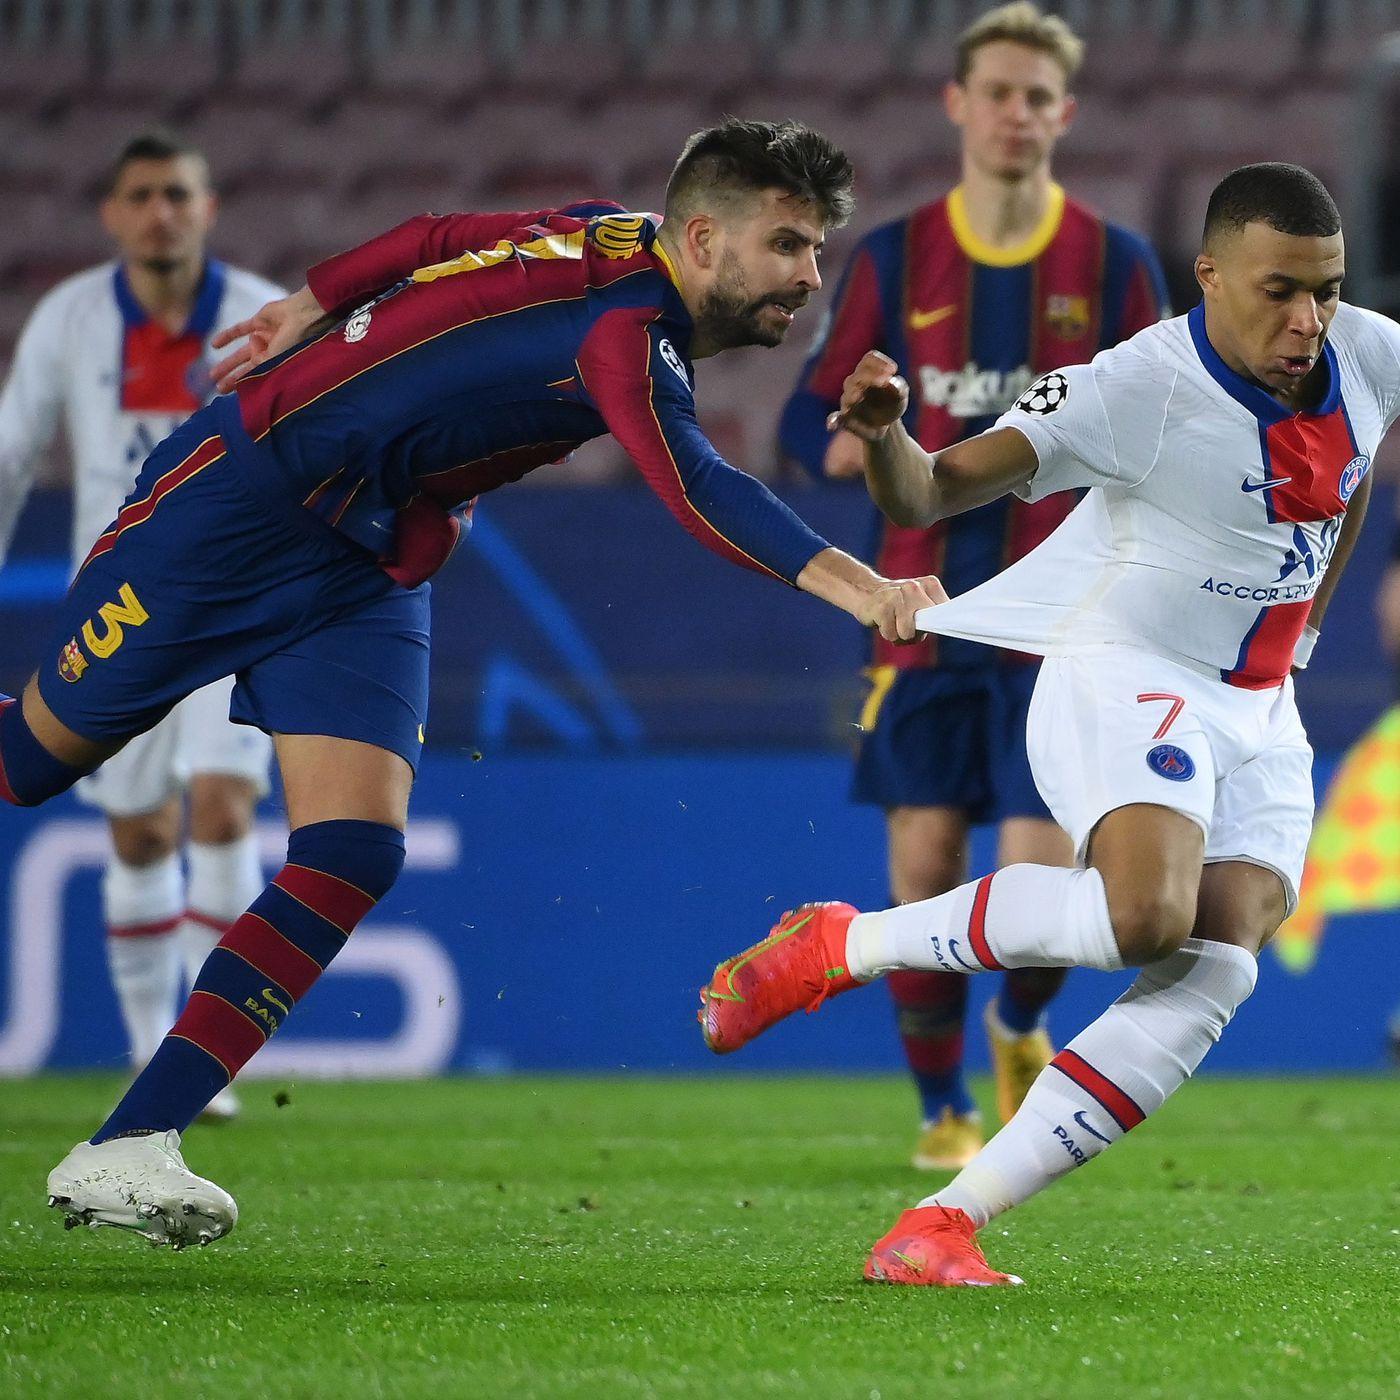 Barcelona Vs Paris Saint Germain Champions League Final Score 1 4 Barca Destroyed At Home By Kylian Mbappe Barca Blaugranes